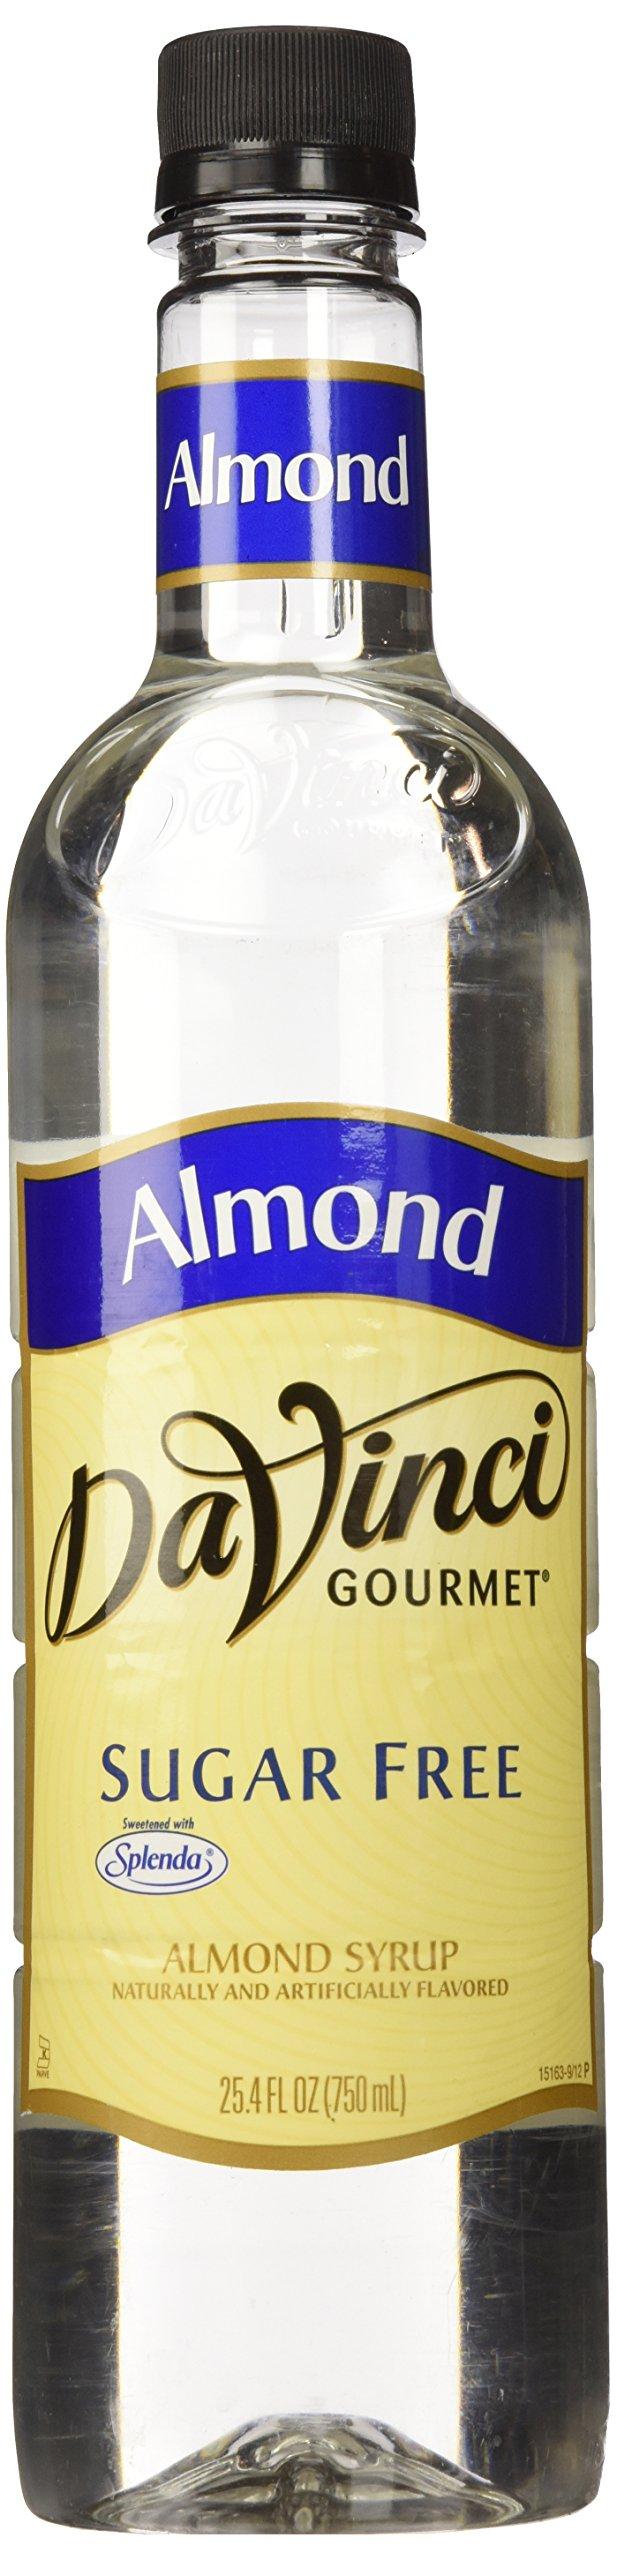 Davinci Sugar-Free Almond Syrup - 750Ml Plastic Bottle